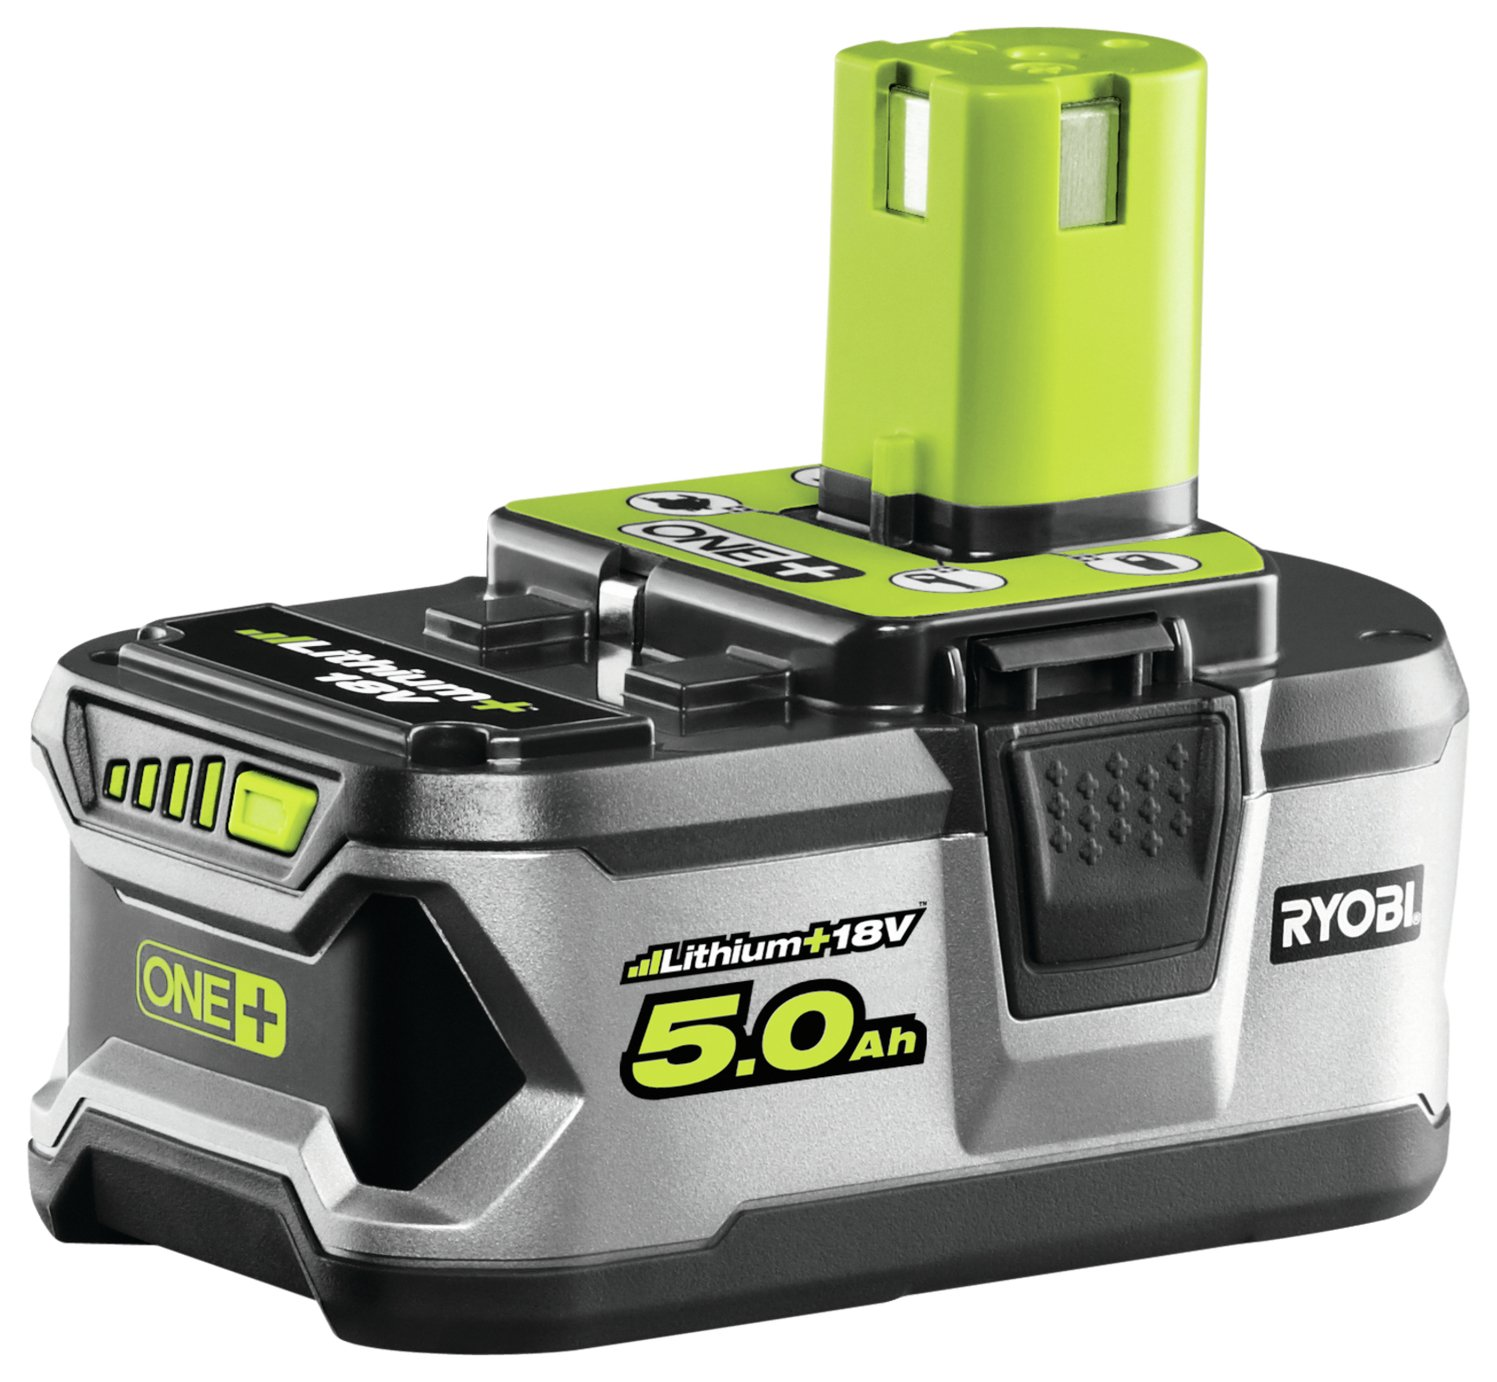 Ryobi RB18L50 ONE+ 5.0Ah Battery - 18V